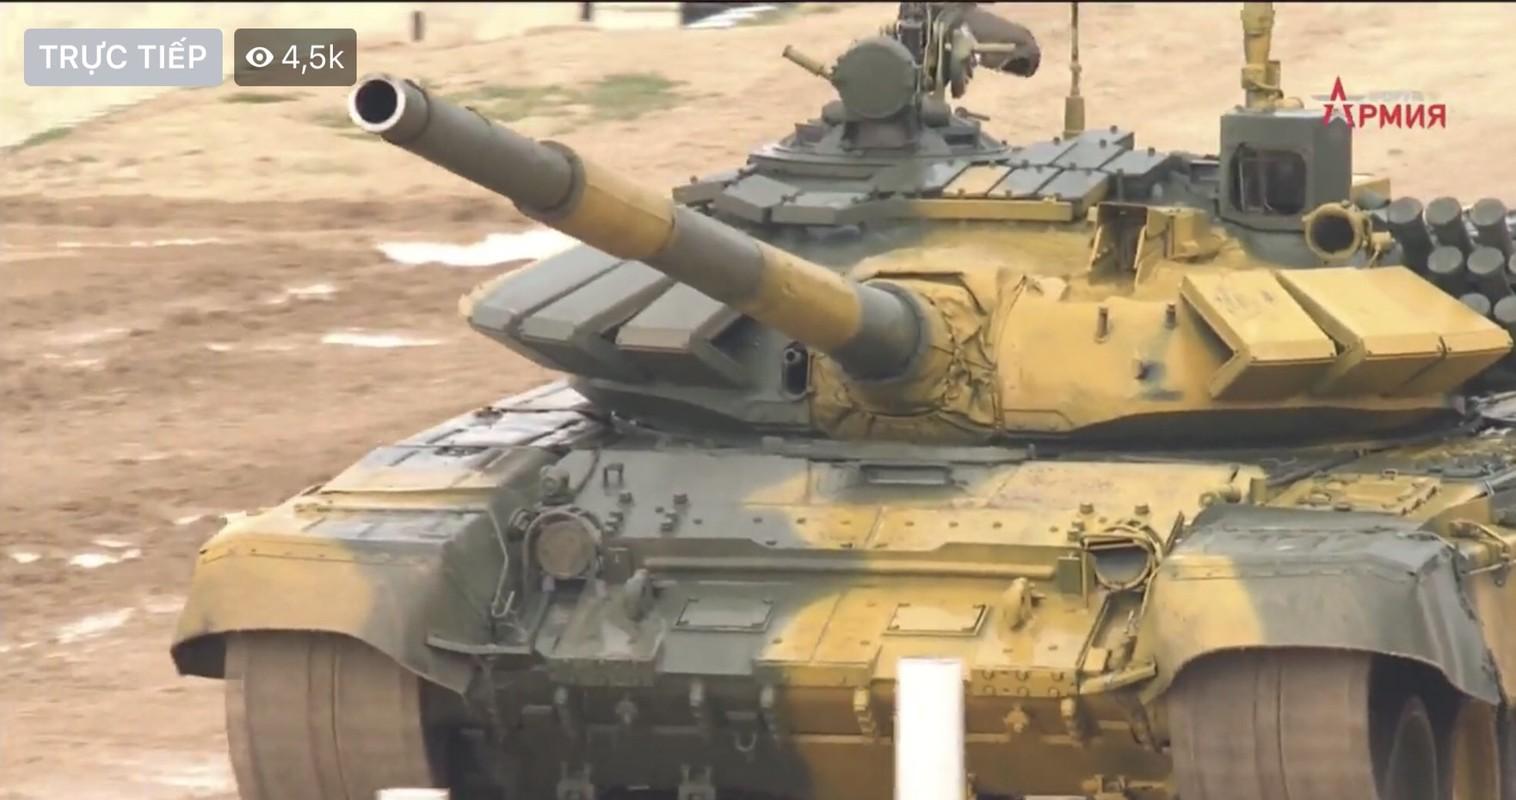 Chay nhanh, ban chuan... tuyen xe tang Viet Nam khai tran Army Games thang loi!-Hinh-7